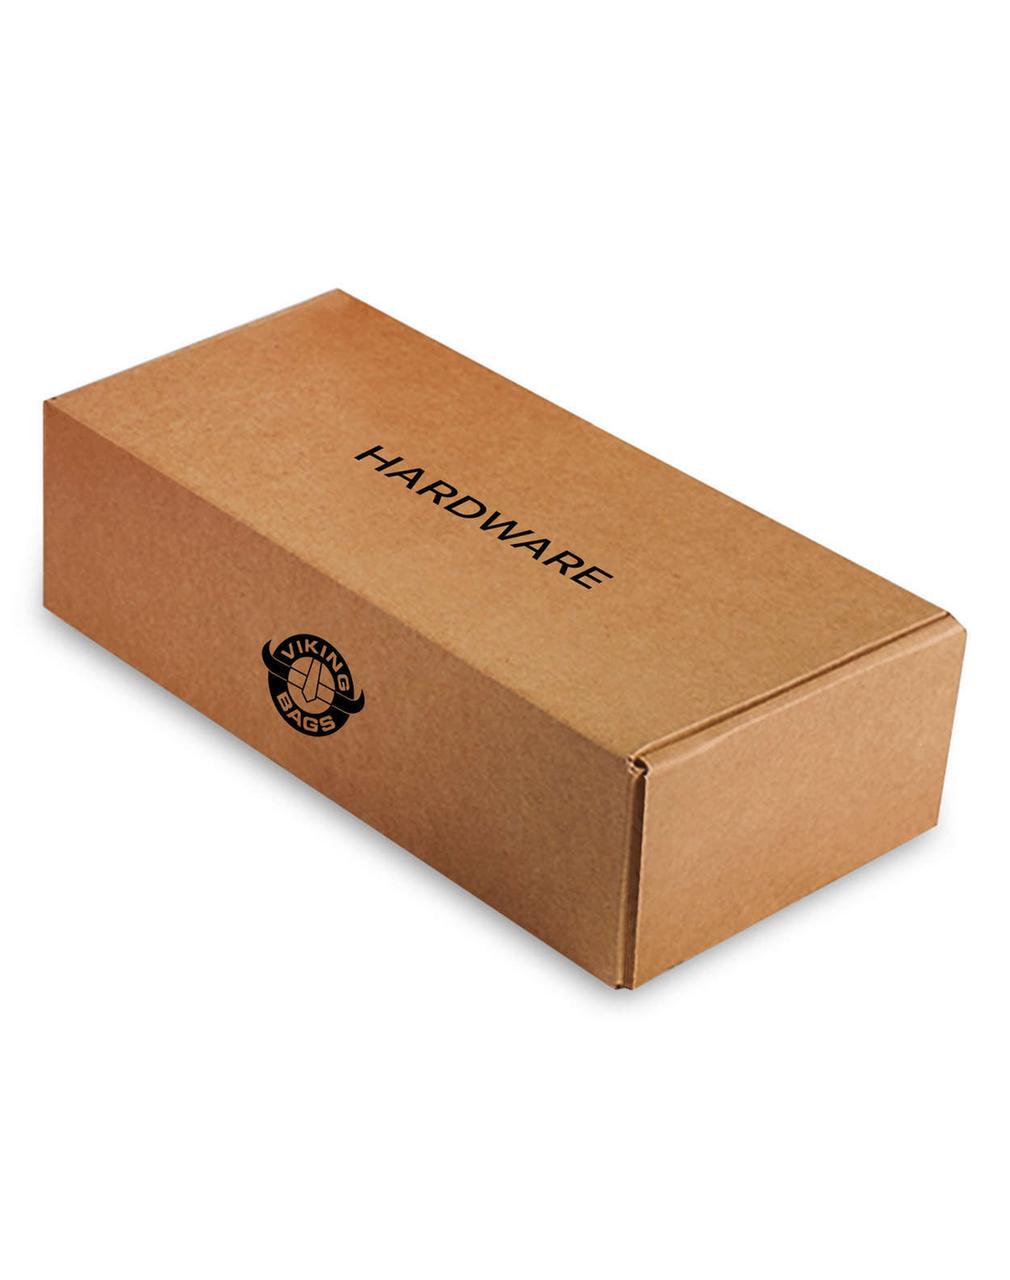 Triumph Rocket III Range Viking Lamellar Large Leather Covered Shock Cutout Hard Saddlebag Box